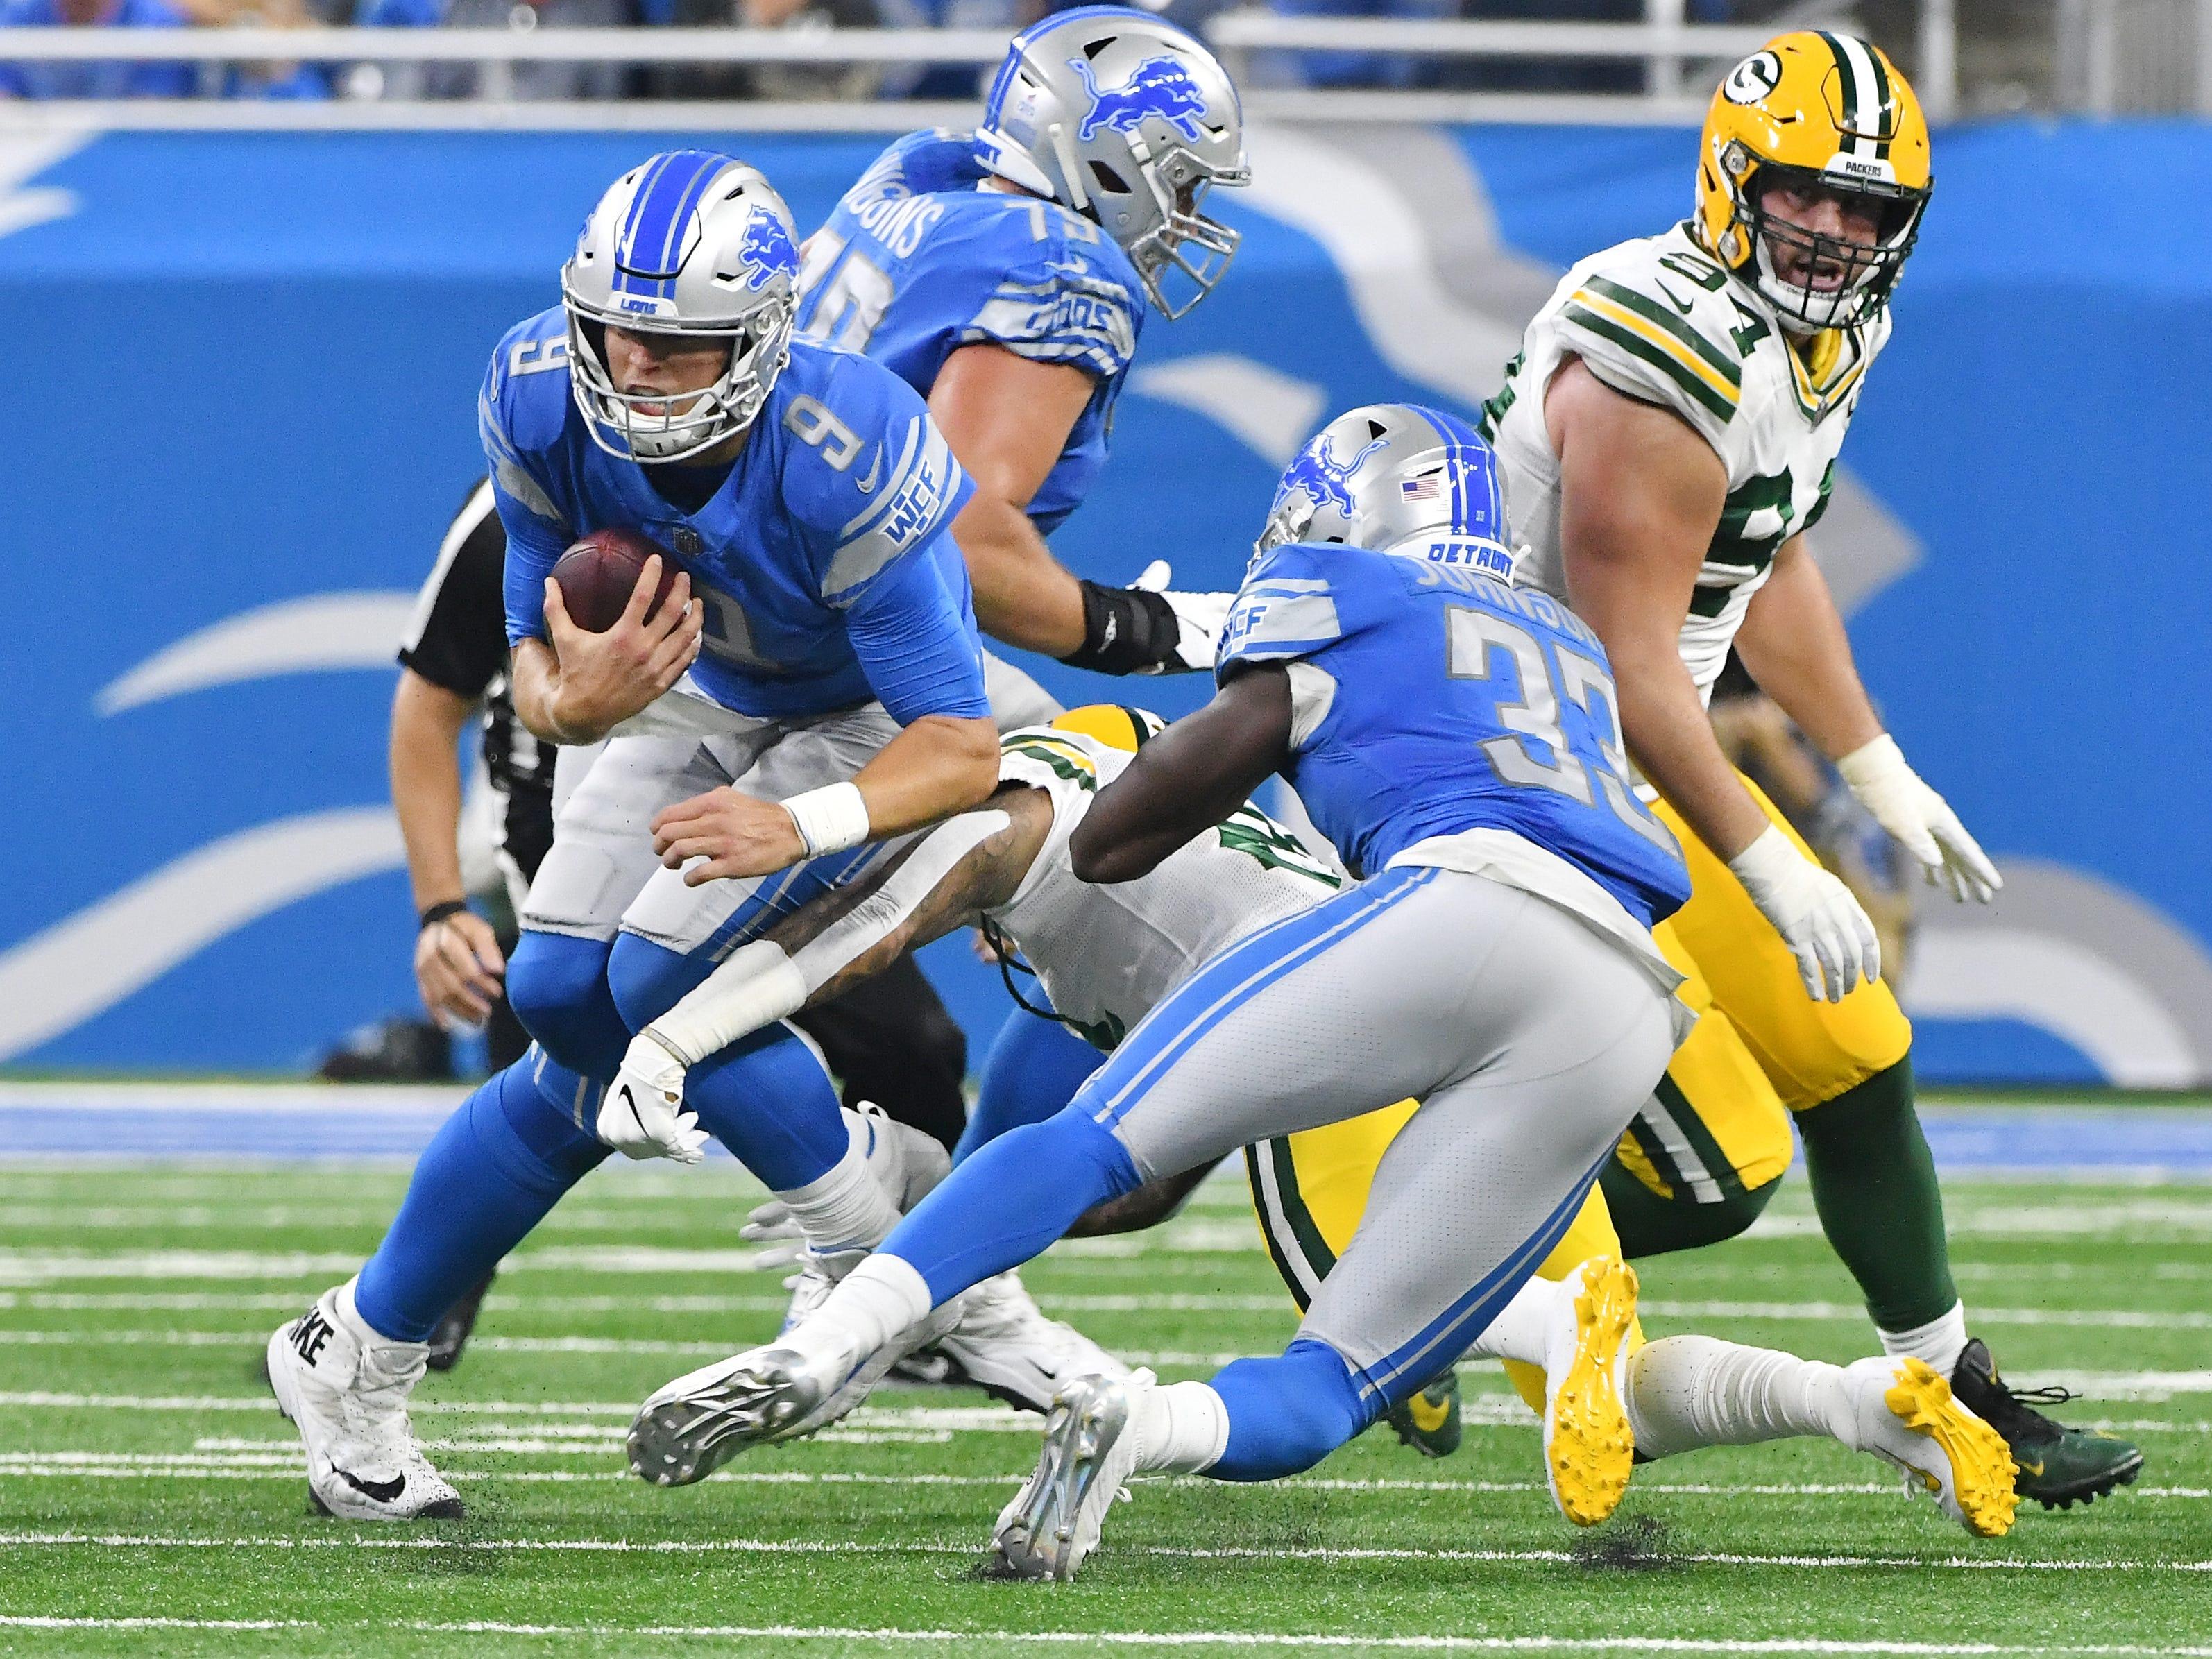 Lions quarterback Matthew Staffod gets sacked by Green Bays' Ha Ha Clinton-Dix in the second quarter.